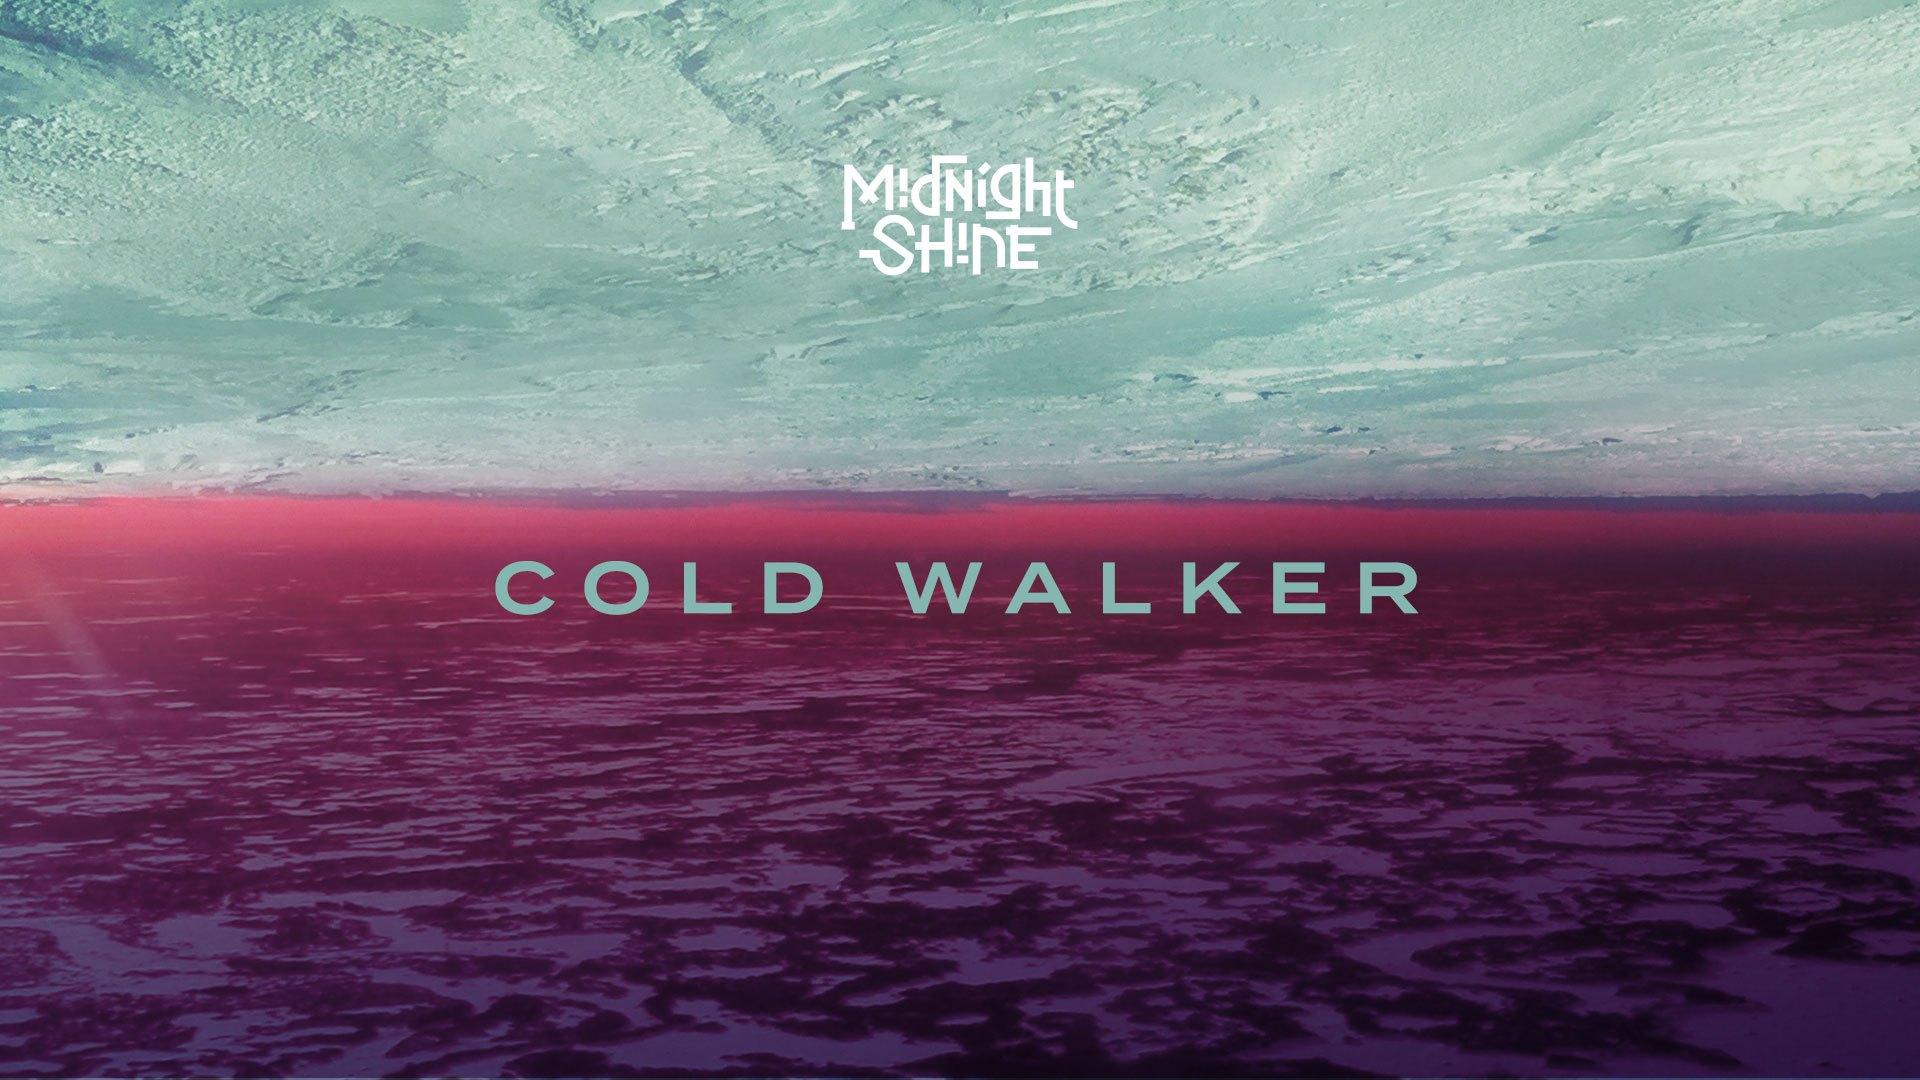 coldwalker-wallpaper-alt